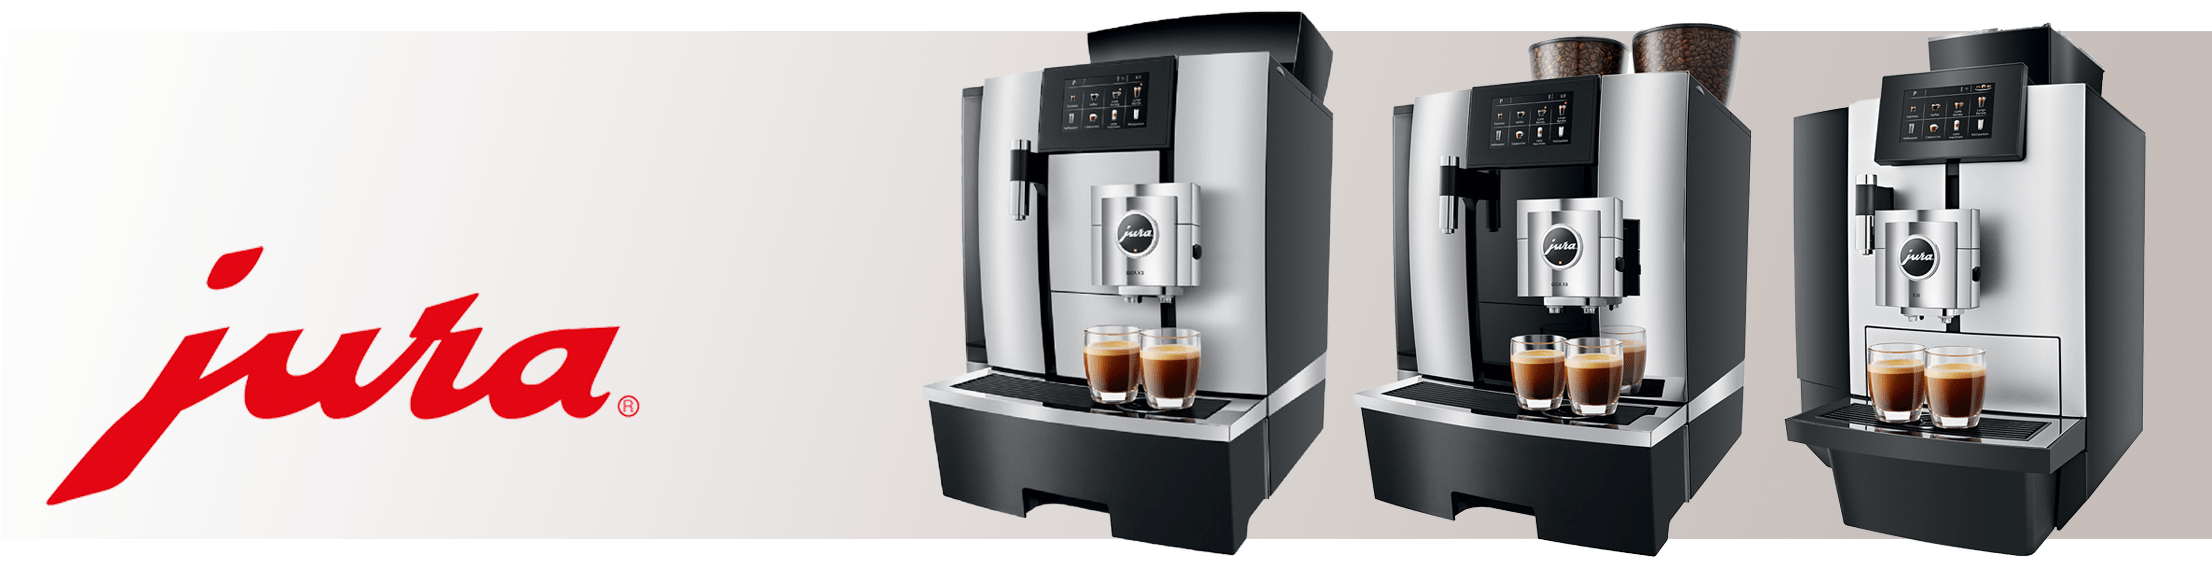 Jura bean to cup coffee machines